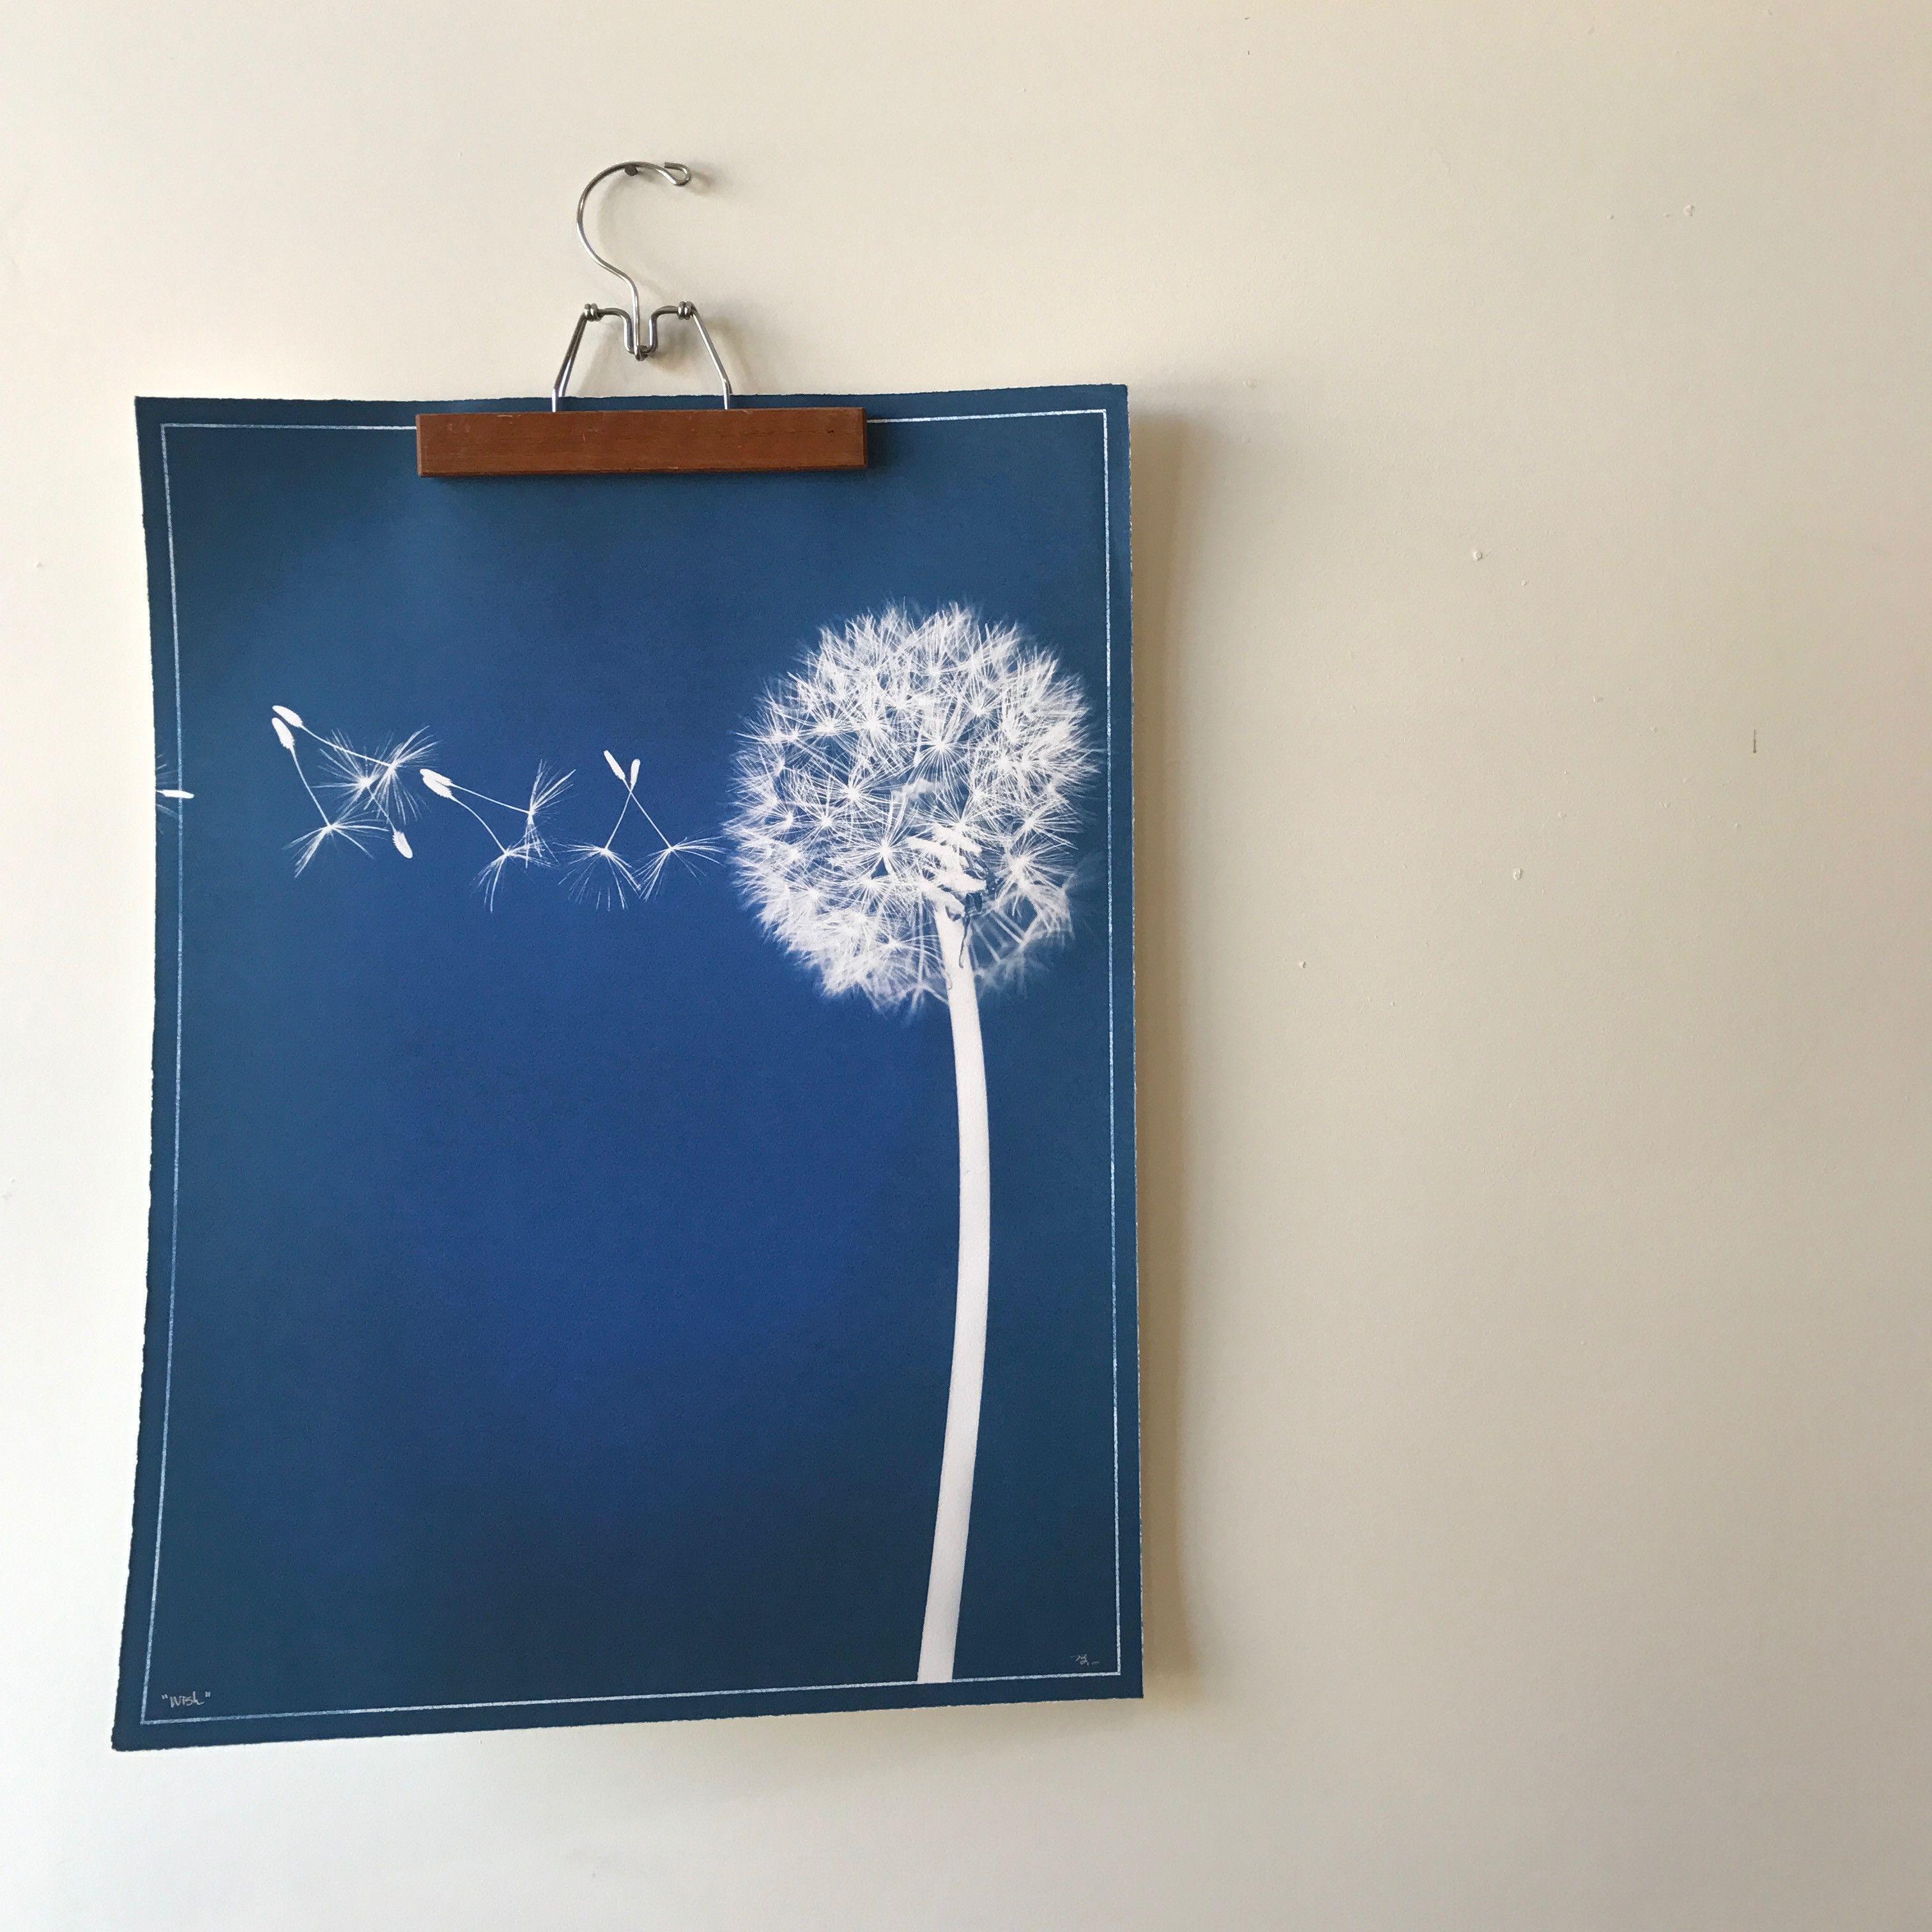 Wish print on blueprint paper by barloga studios studio and products wish print on blueprint paper by barloga studios malvernweather Choice Image